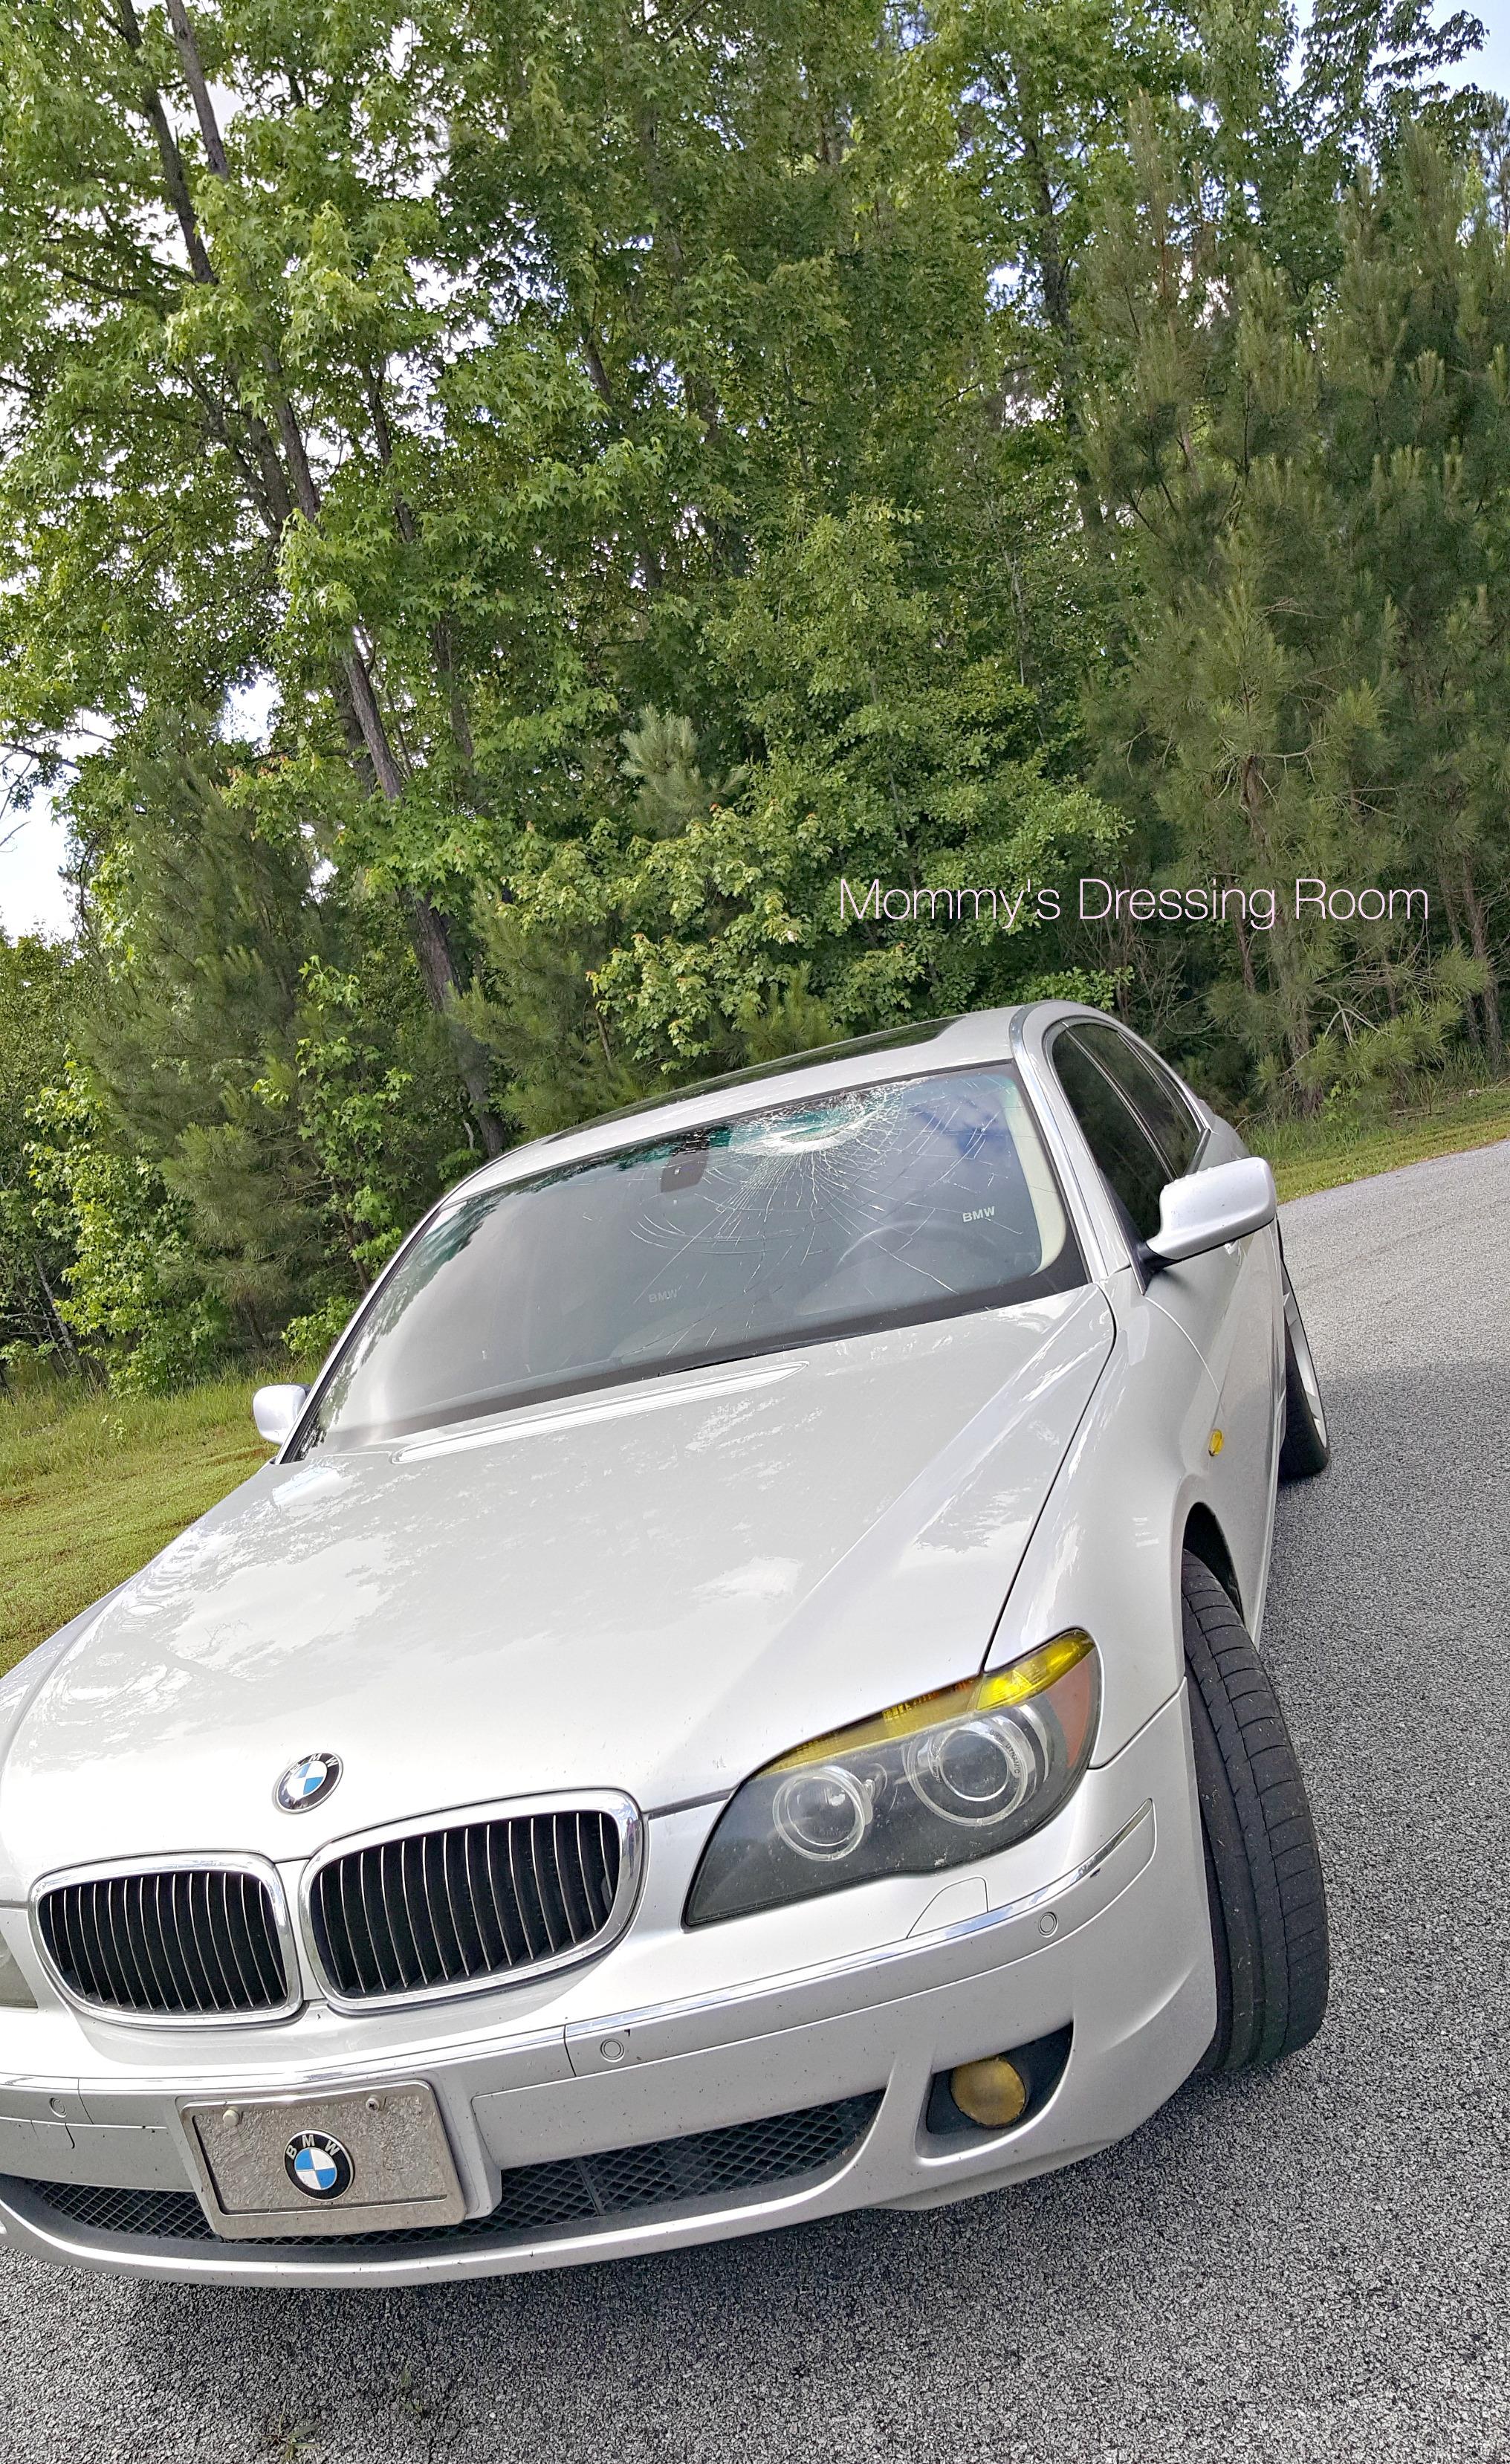 turkey-safelight-country road-bmw-windshield-virginia